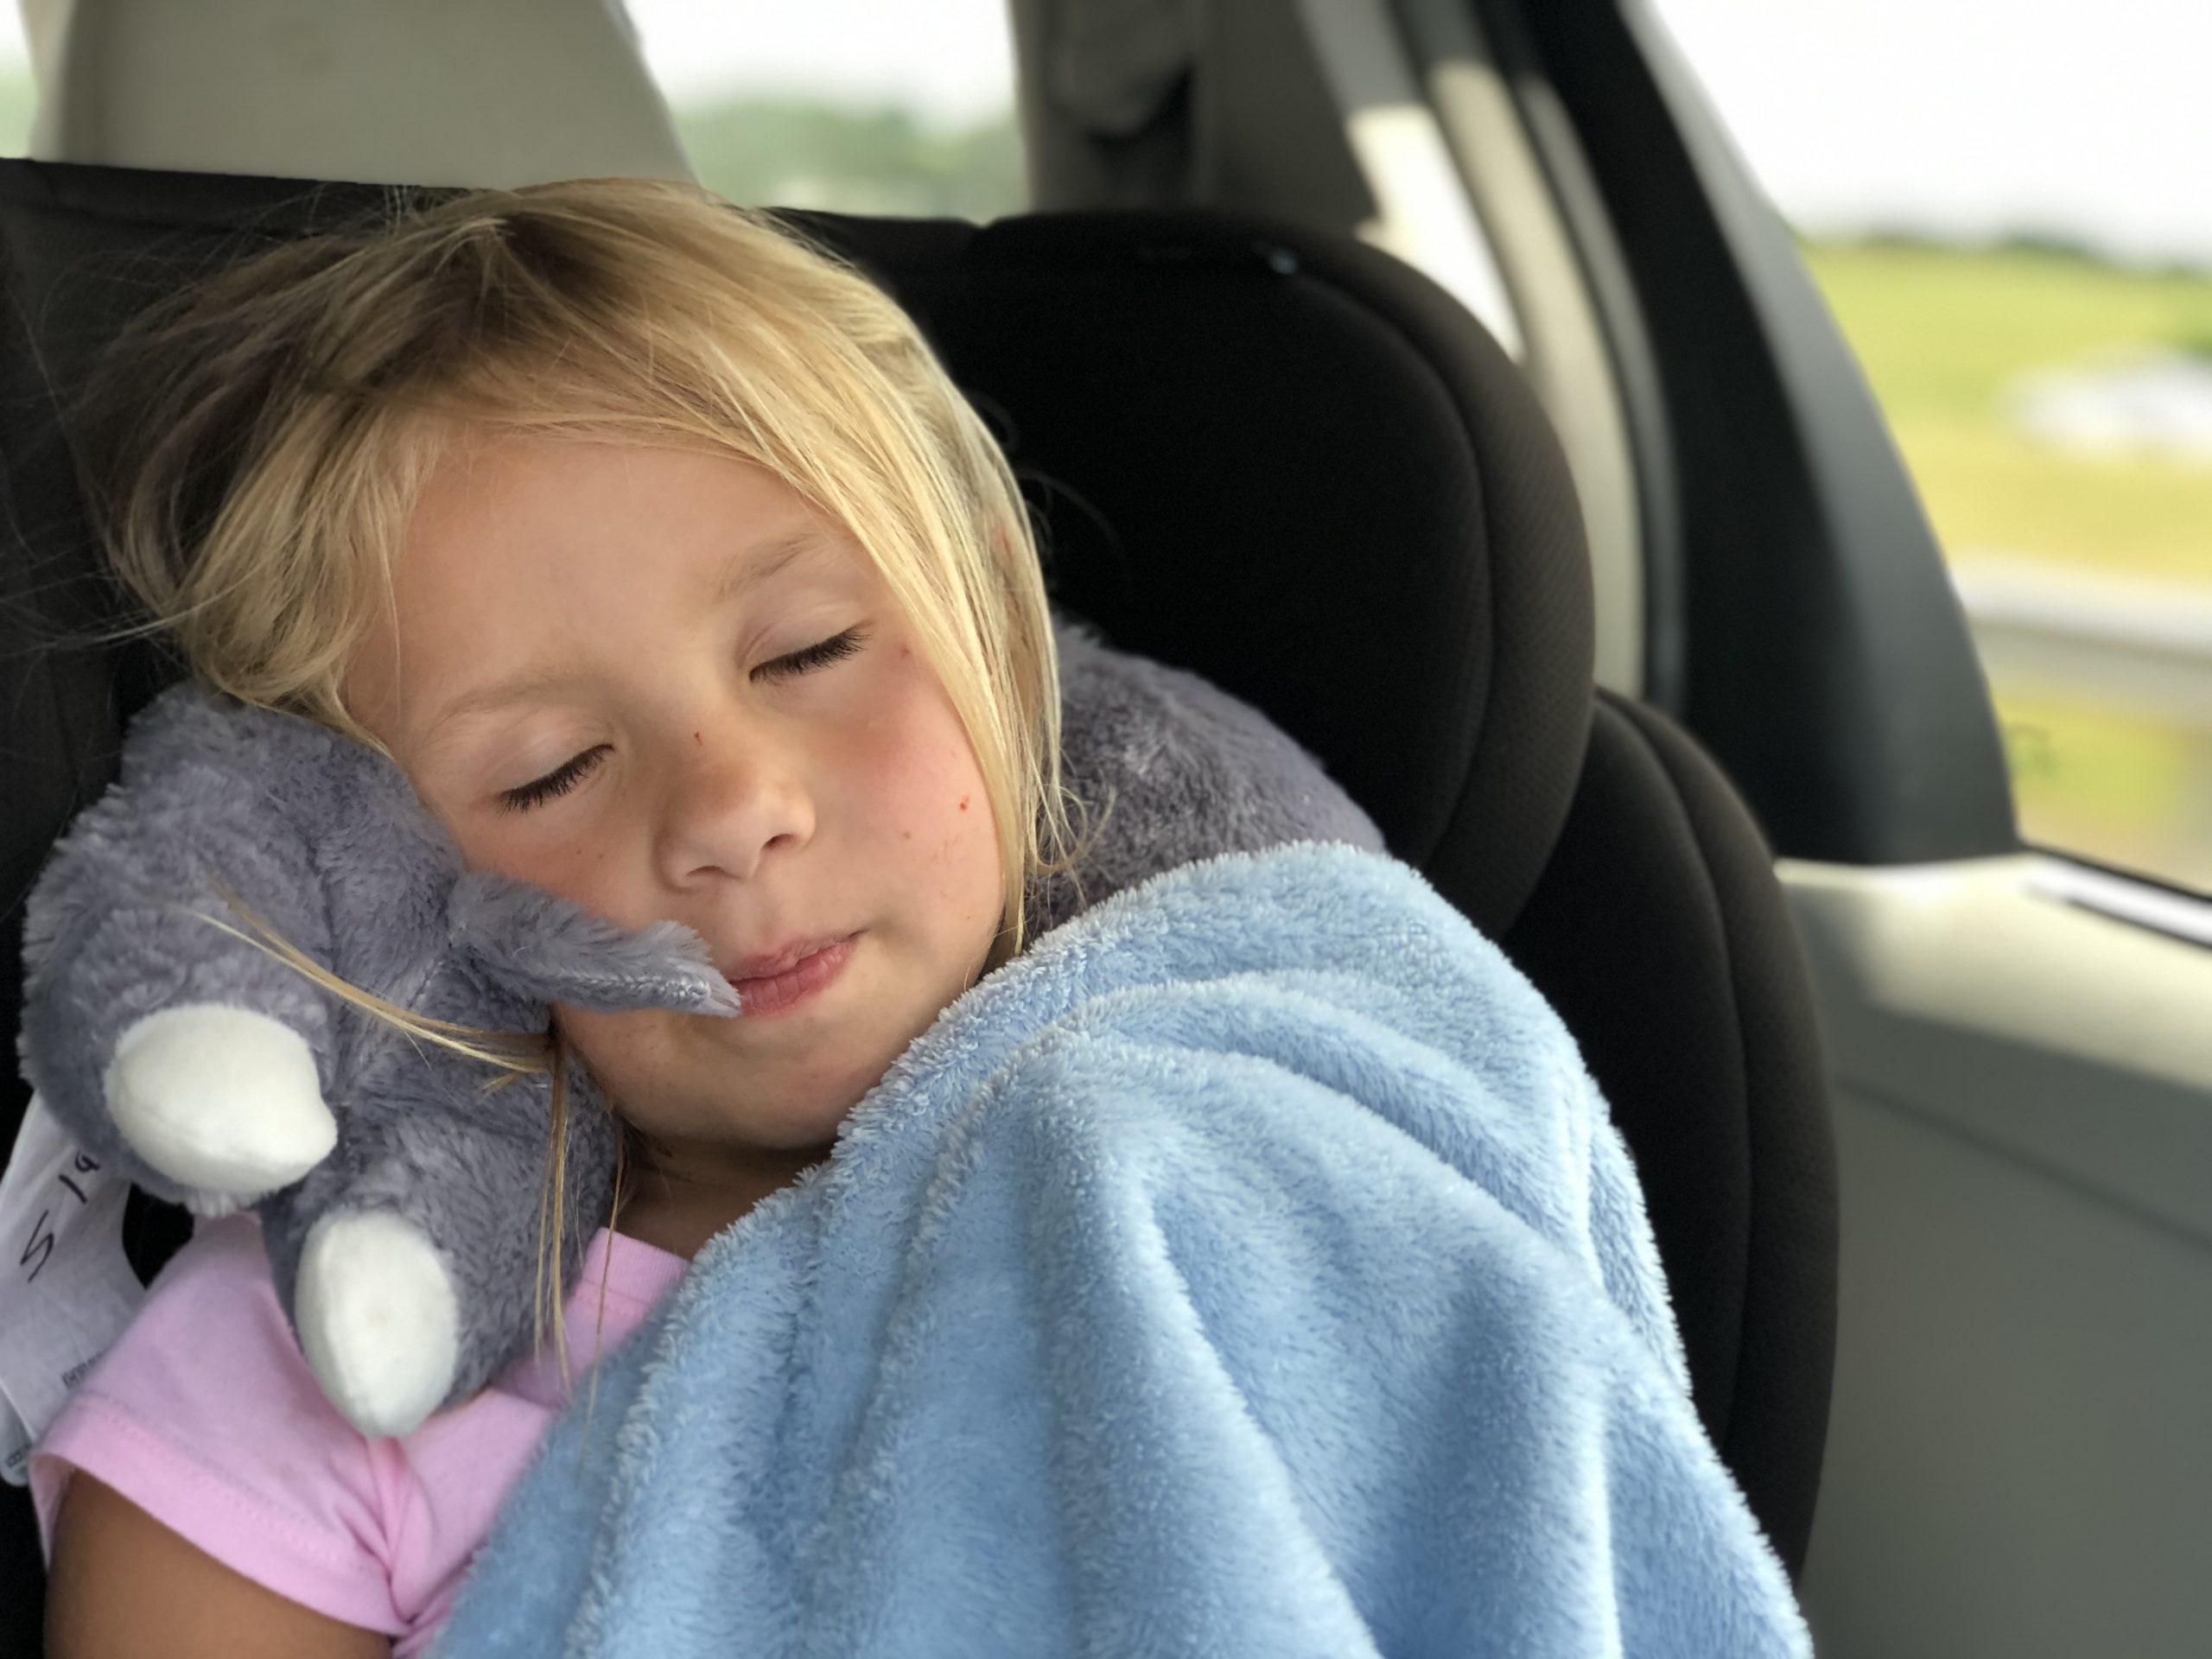 Don T Fear The Drive Tackling Long Car Rides With Kiddos